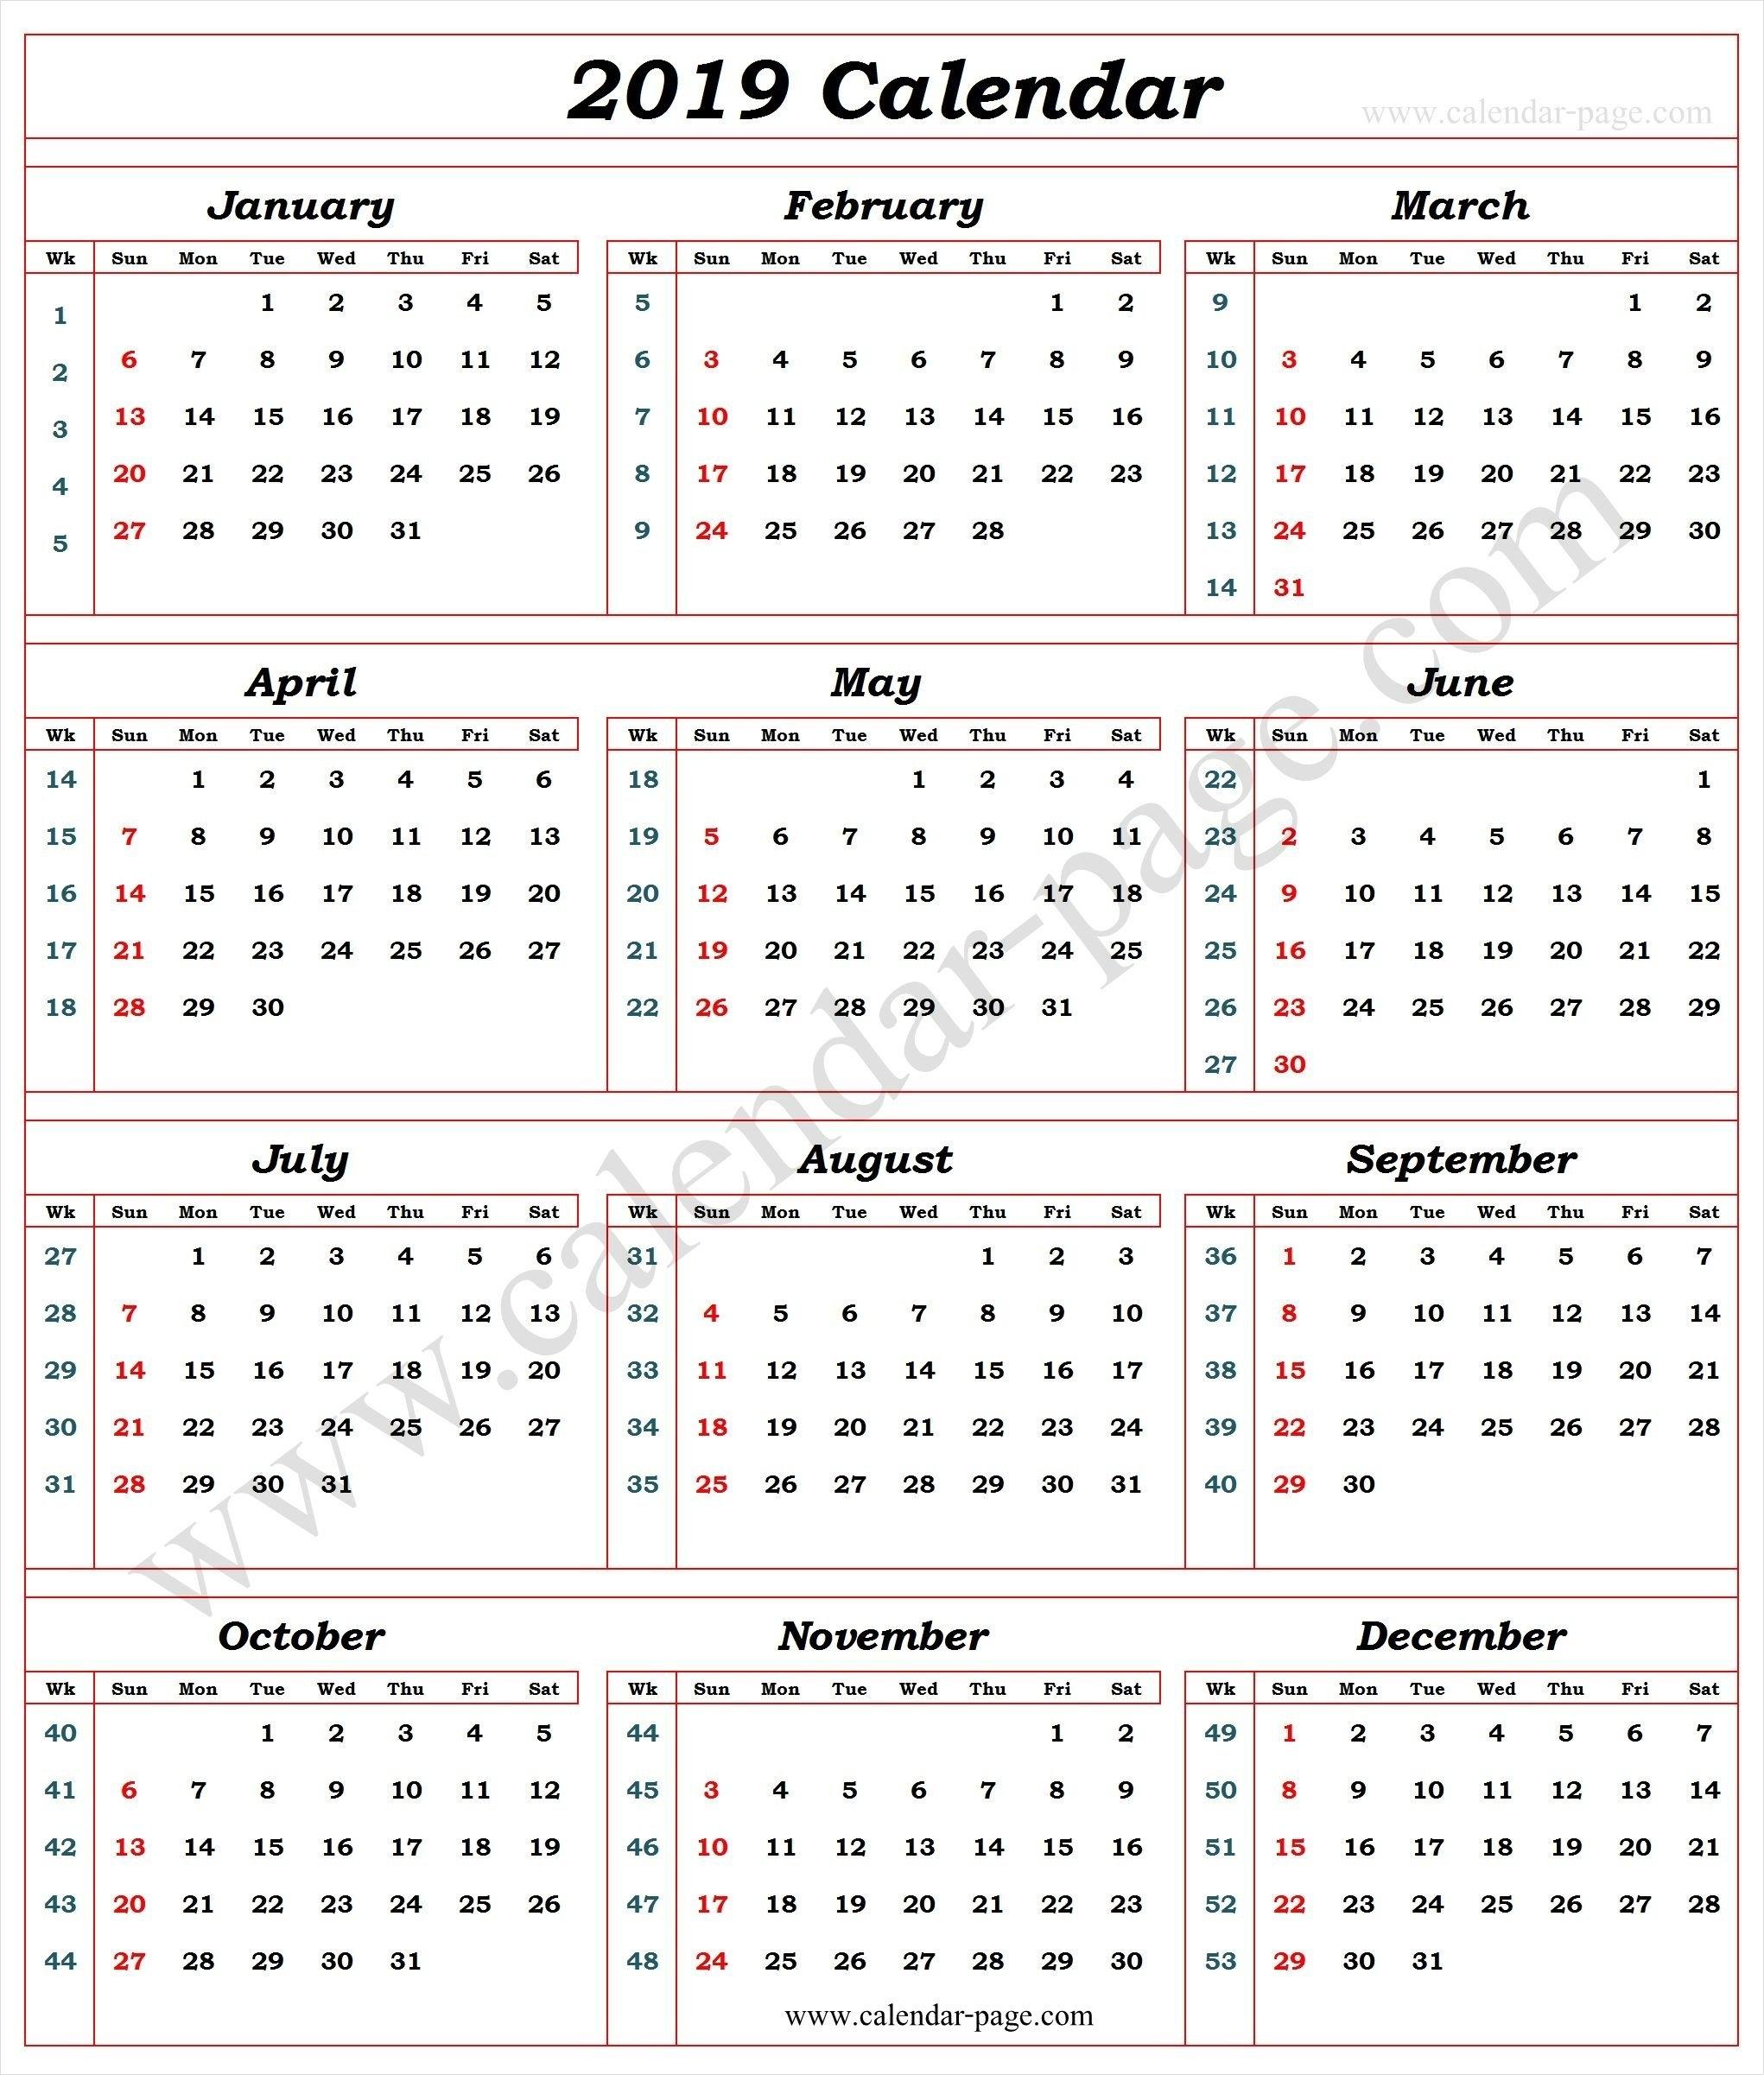 Calendar 2019 With Week Numbers | 2019 Calendar Template | Pinterest Calendar Week 8 2019